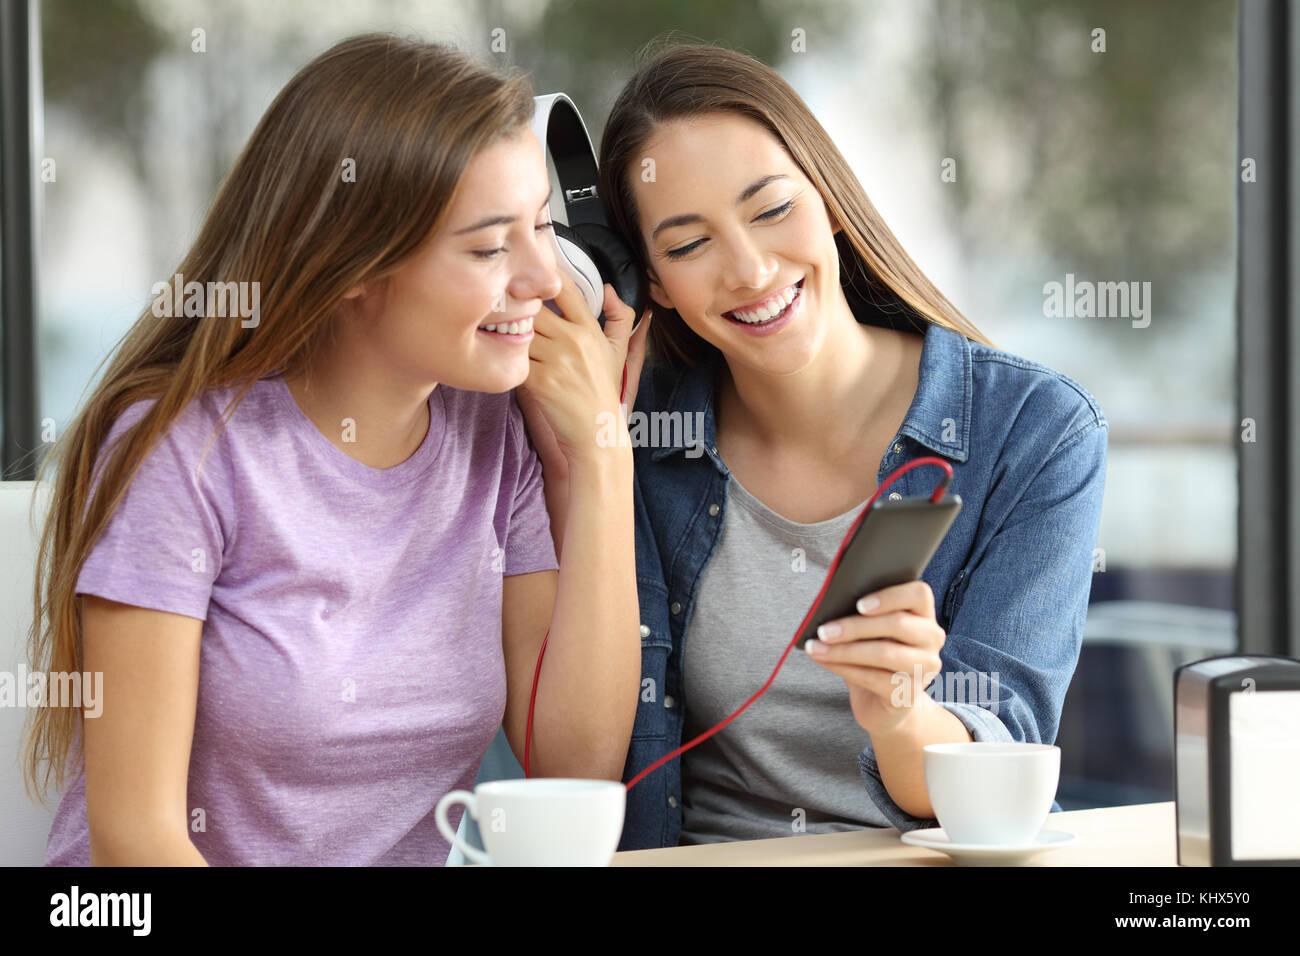 Dos amigos felices de compartir en línea sentado en un bar de música Imagen De Stock